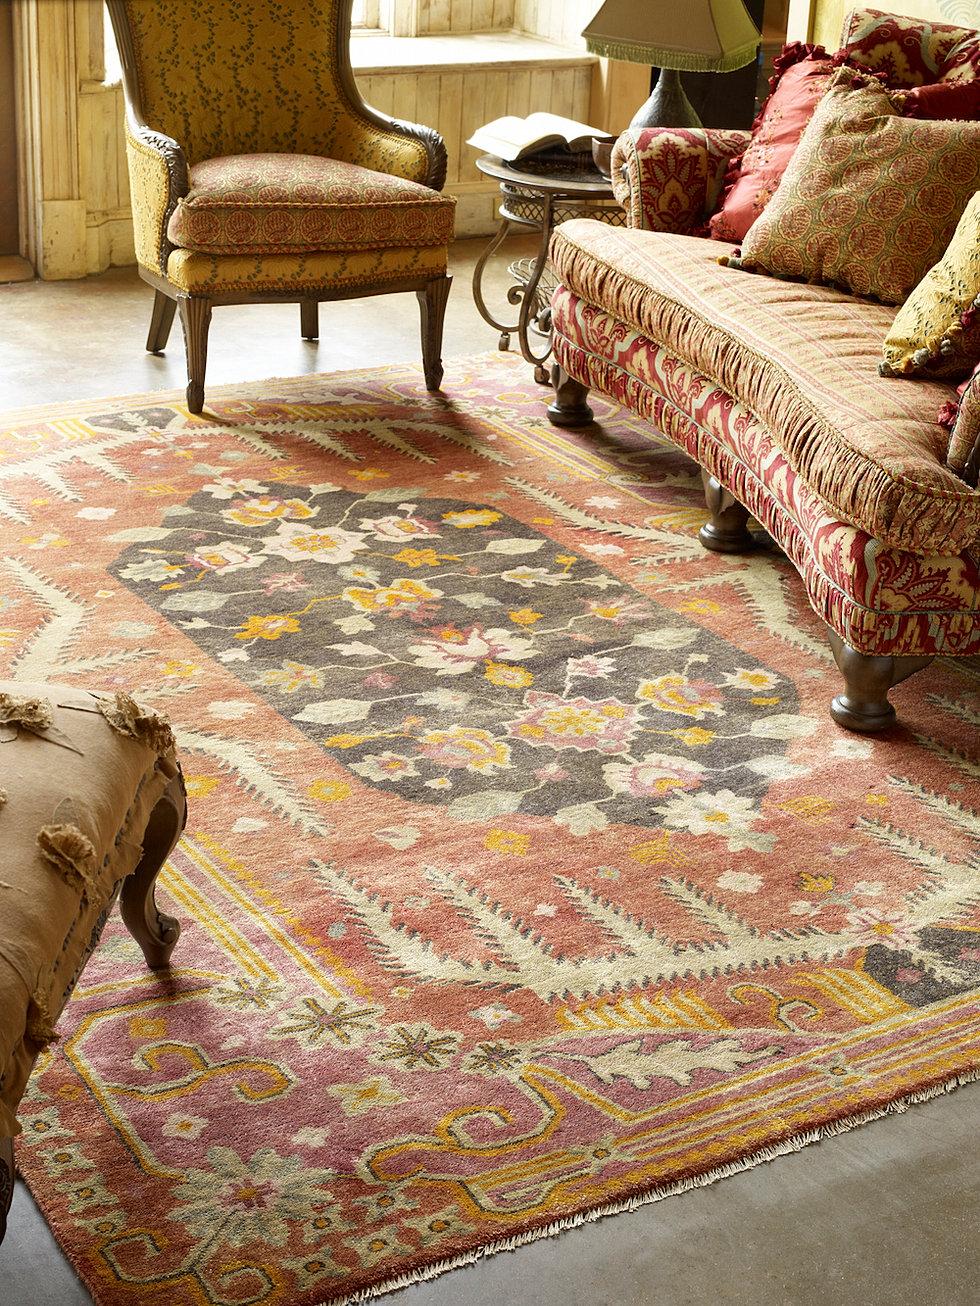 rug tx ct dallas stark ilves sale carpet norwalk s rugs info